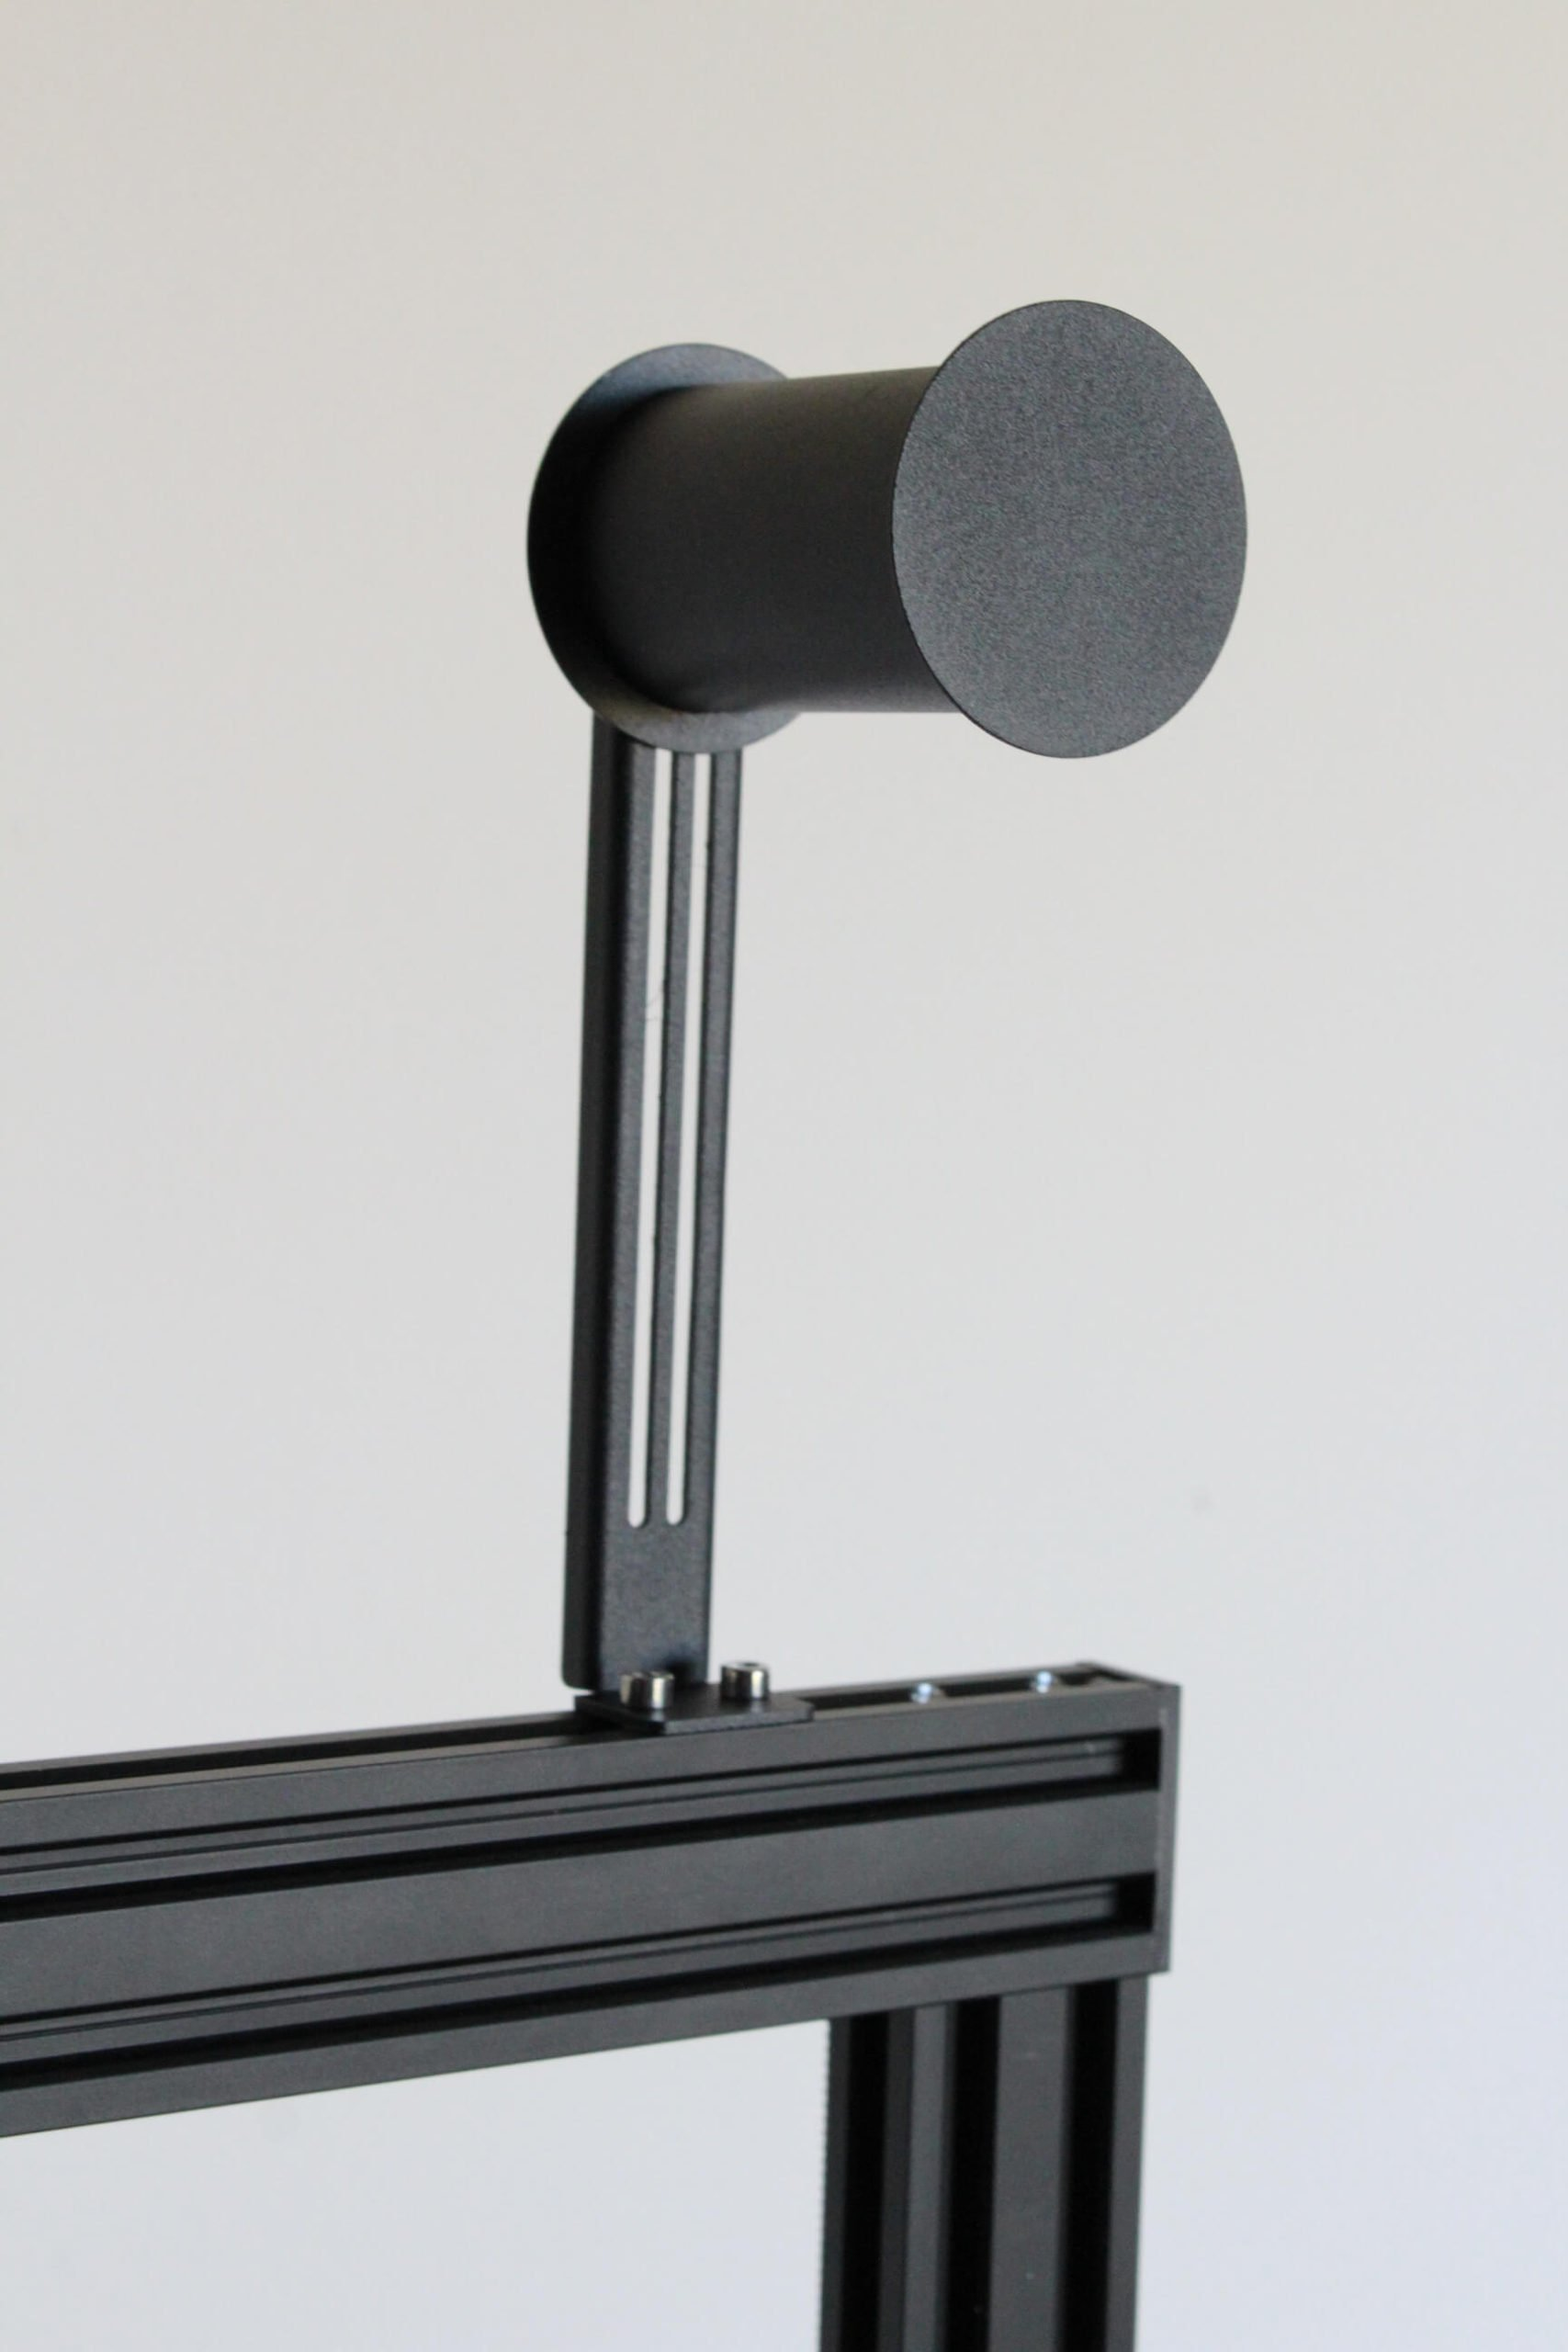 Mingda-D3-Spool-Holder-2